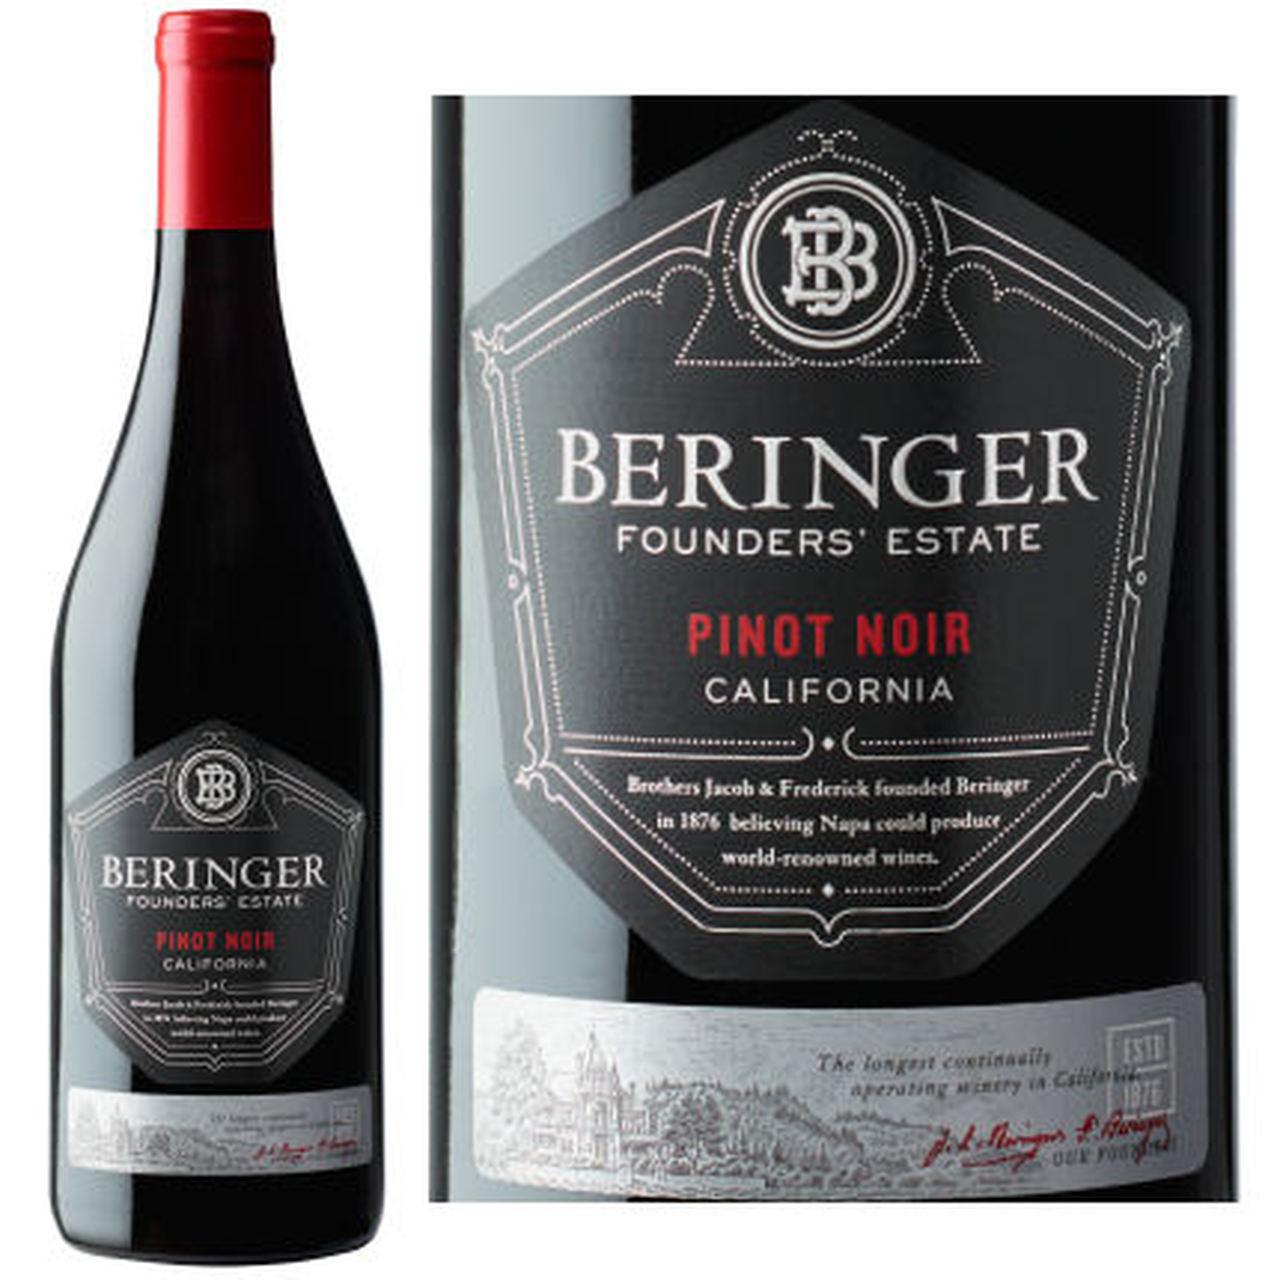 Beringer Founders' Estate California Pinot Noir